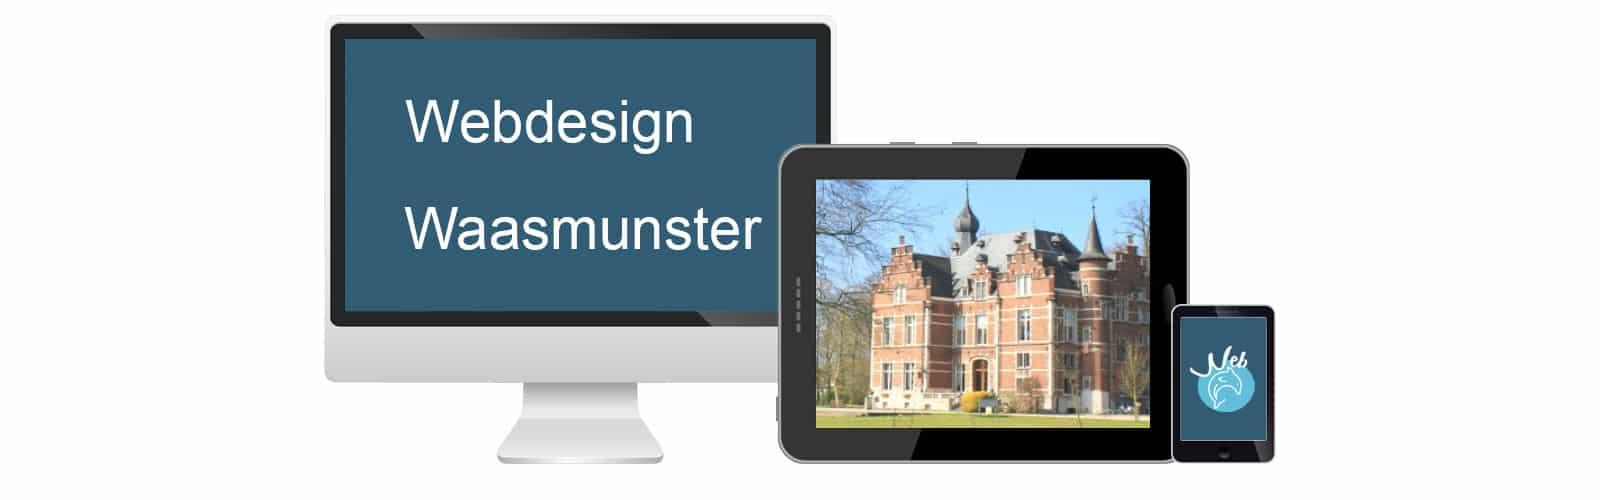 Webdesign Waasmunster - webdolfijn